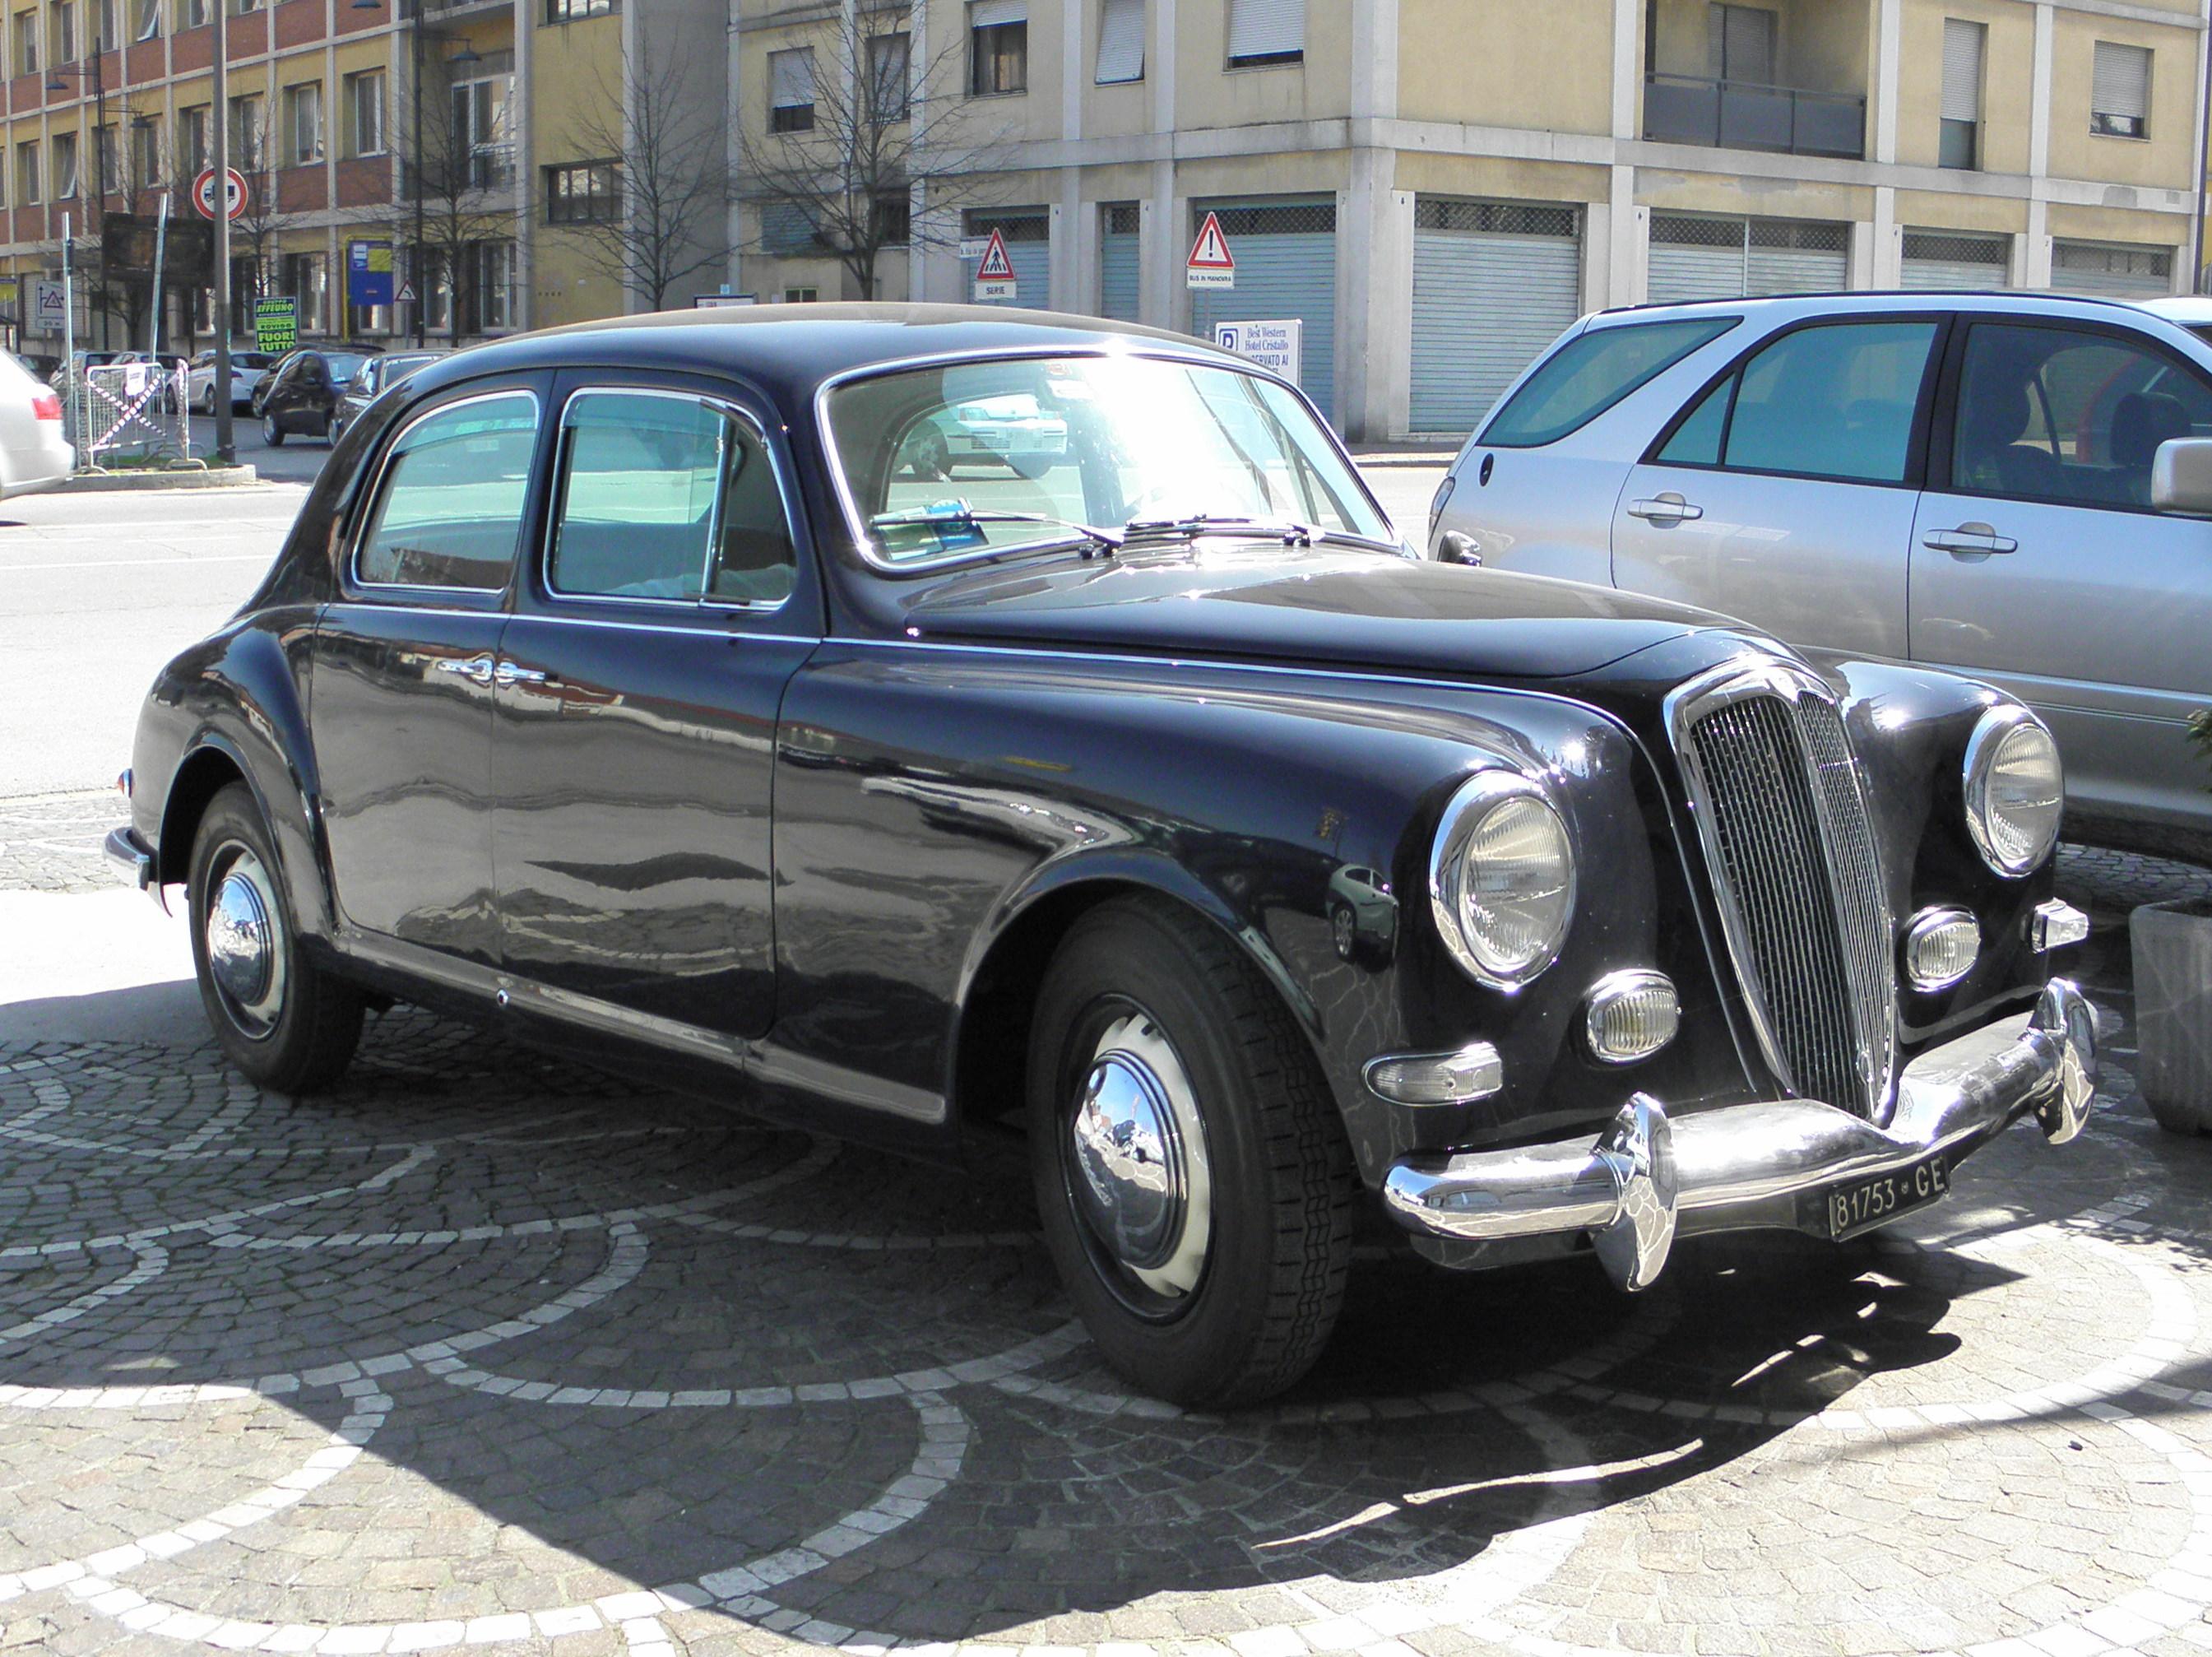 https://upload.wikimedia.org/wikipedia/commons/2/2b/Lancia_Aurelia_B12_in_Rovigo_(2).jpg